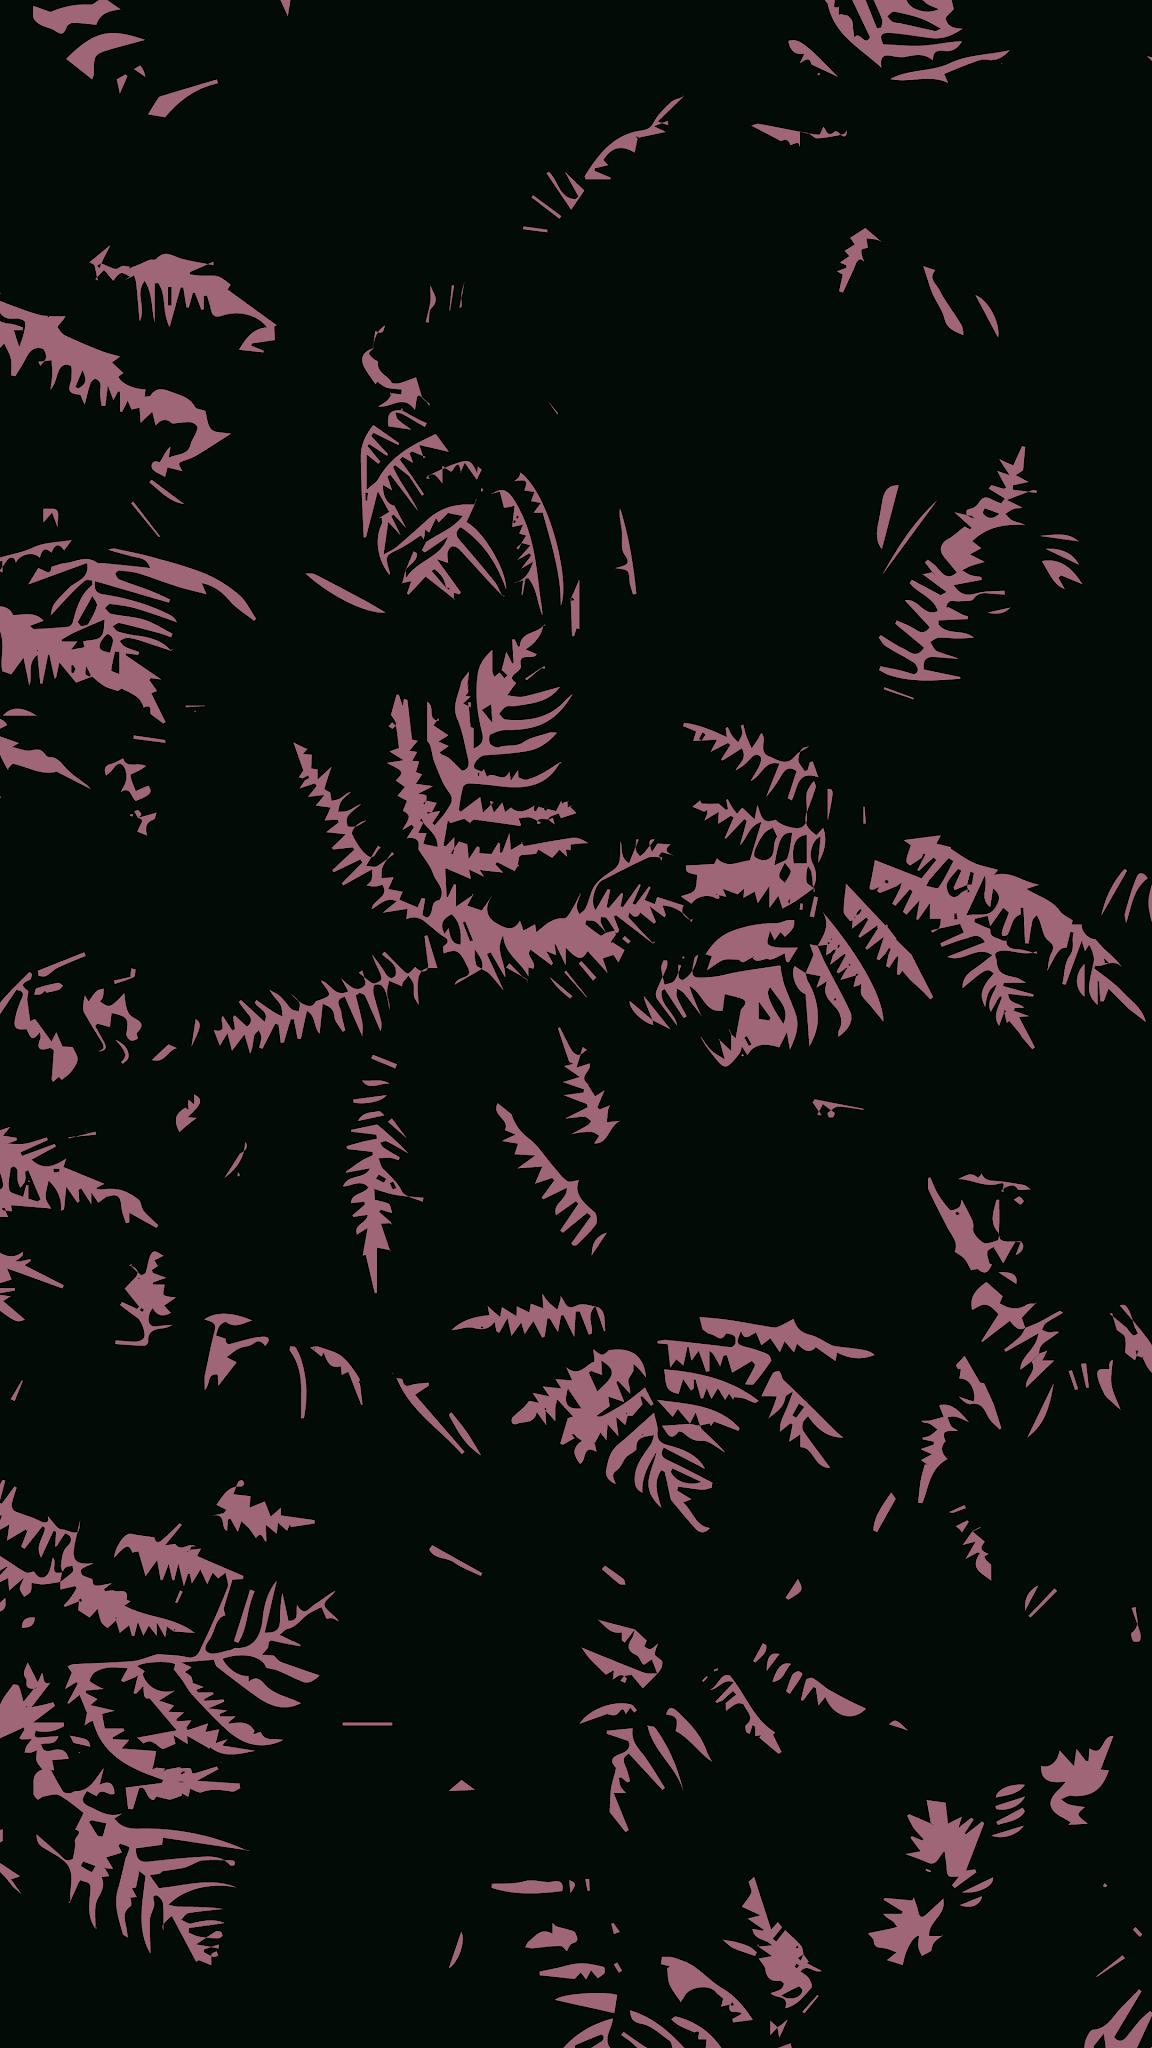 Beautiful dark aesthetic lock screen background wallpaper 4k